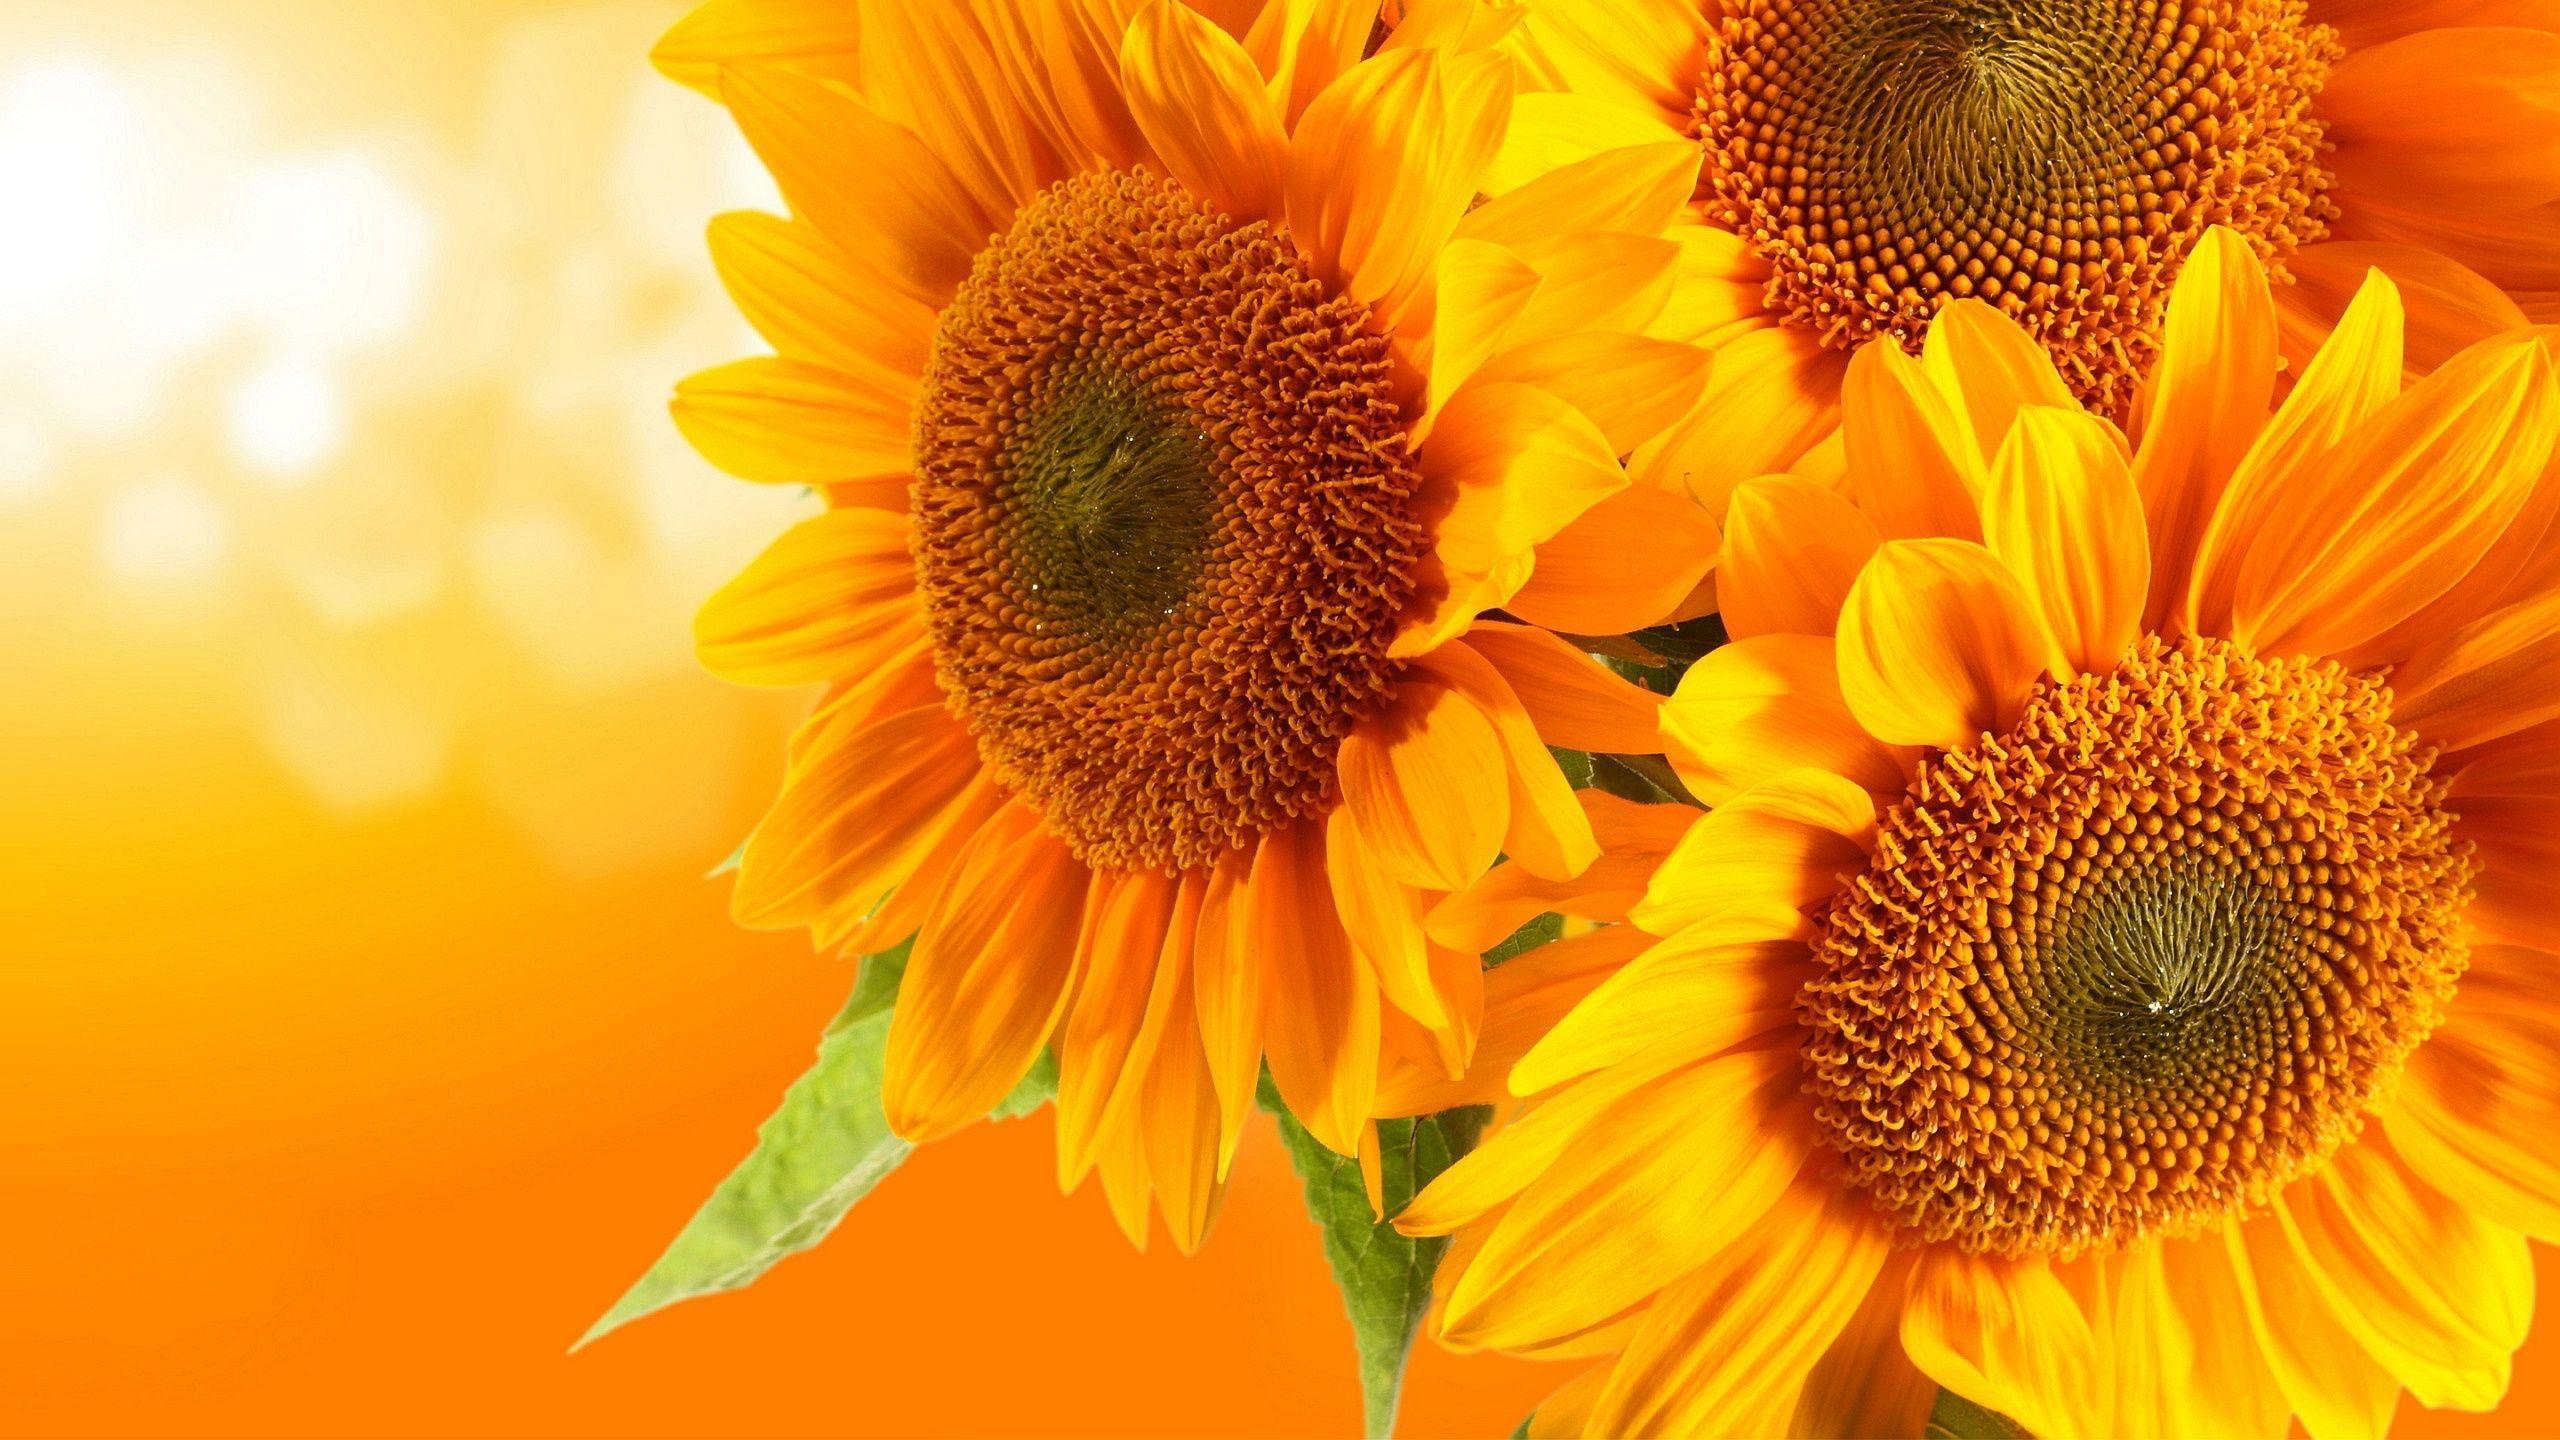 Whimsical Sunflower Desktop Wallpapers - Top Free ...